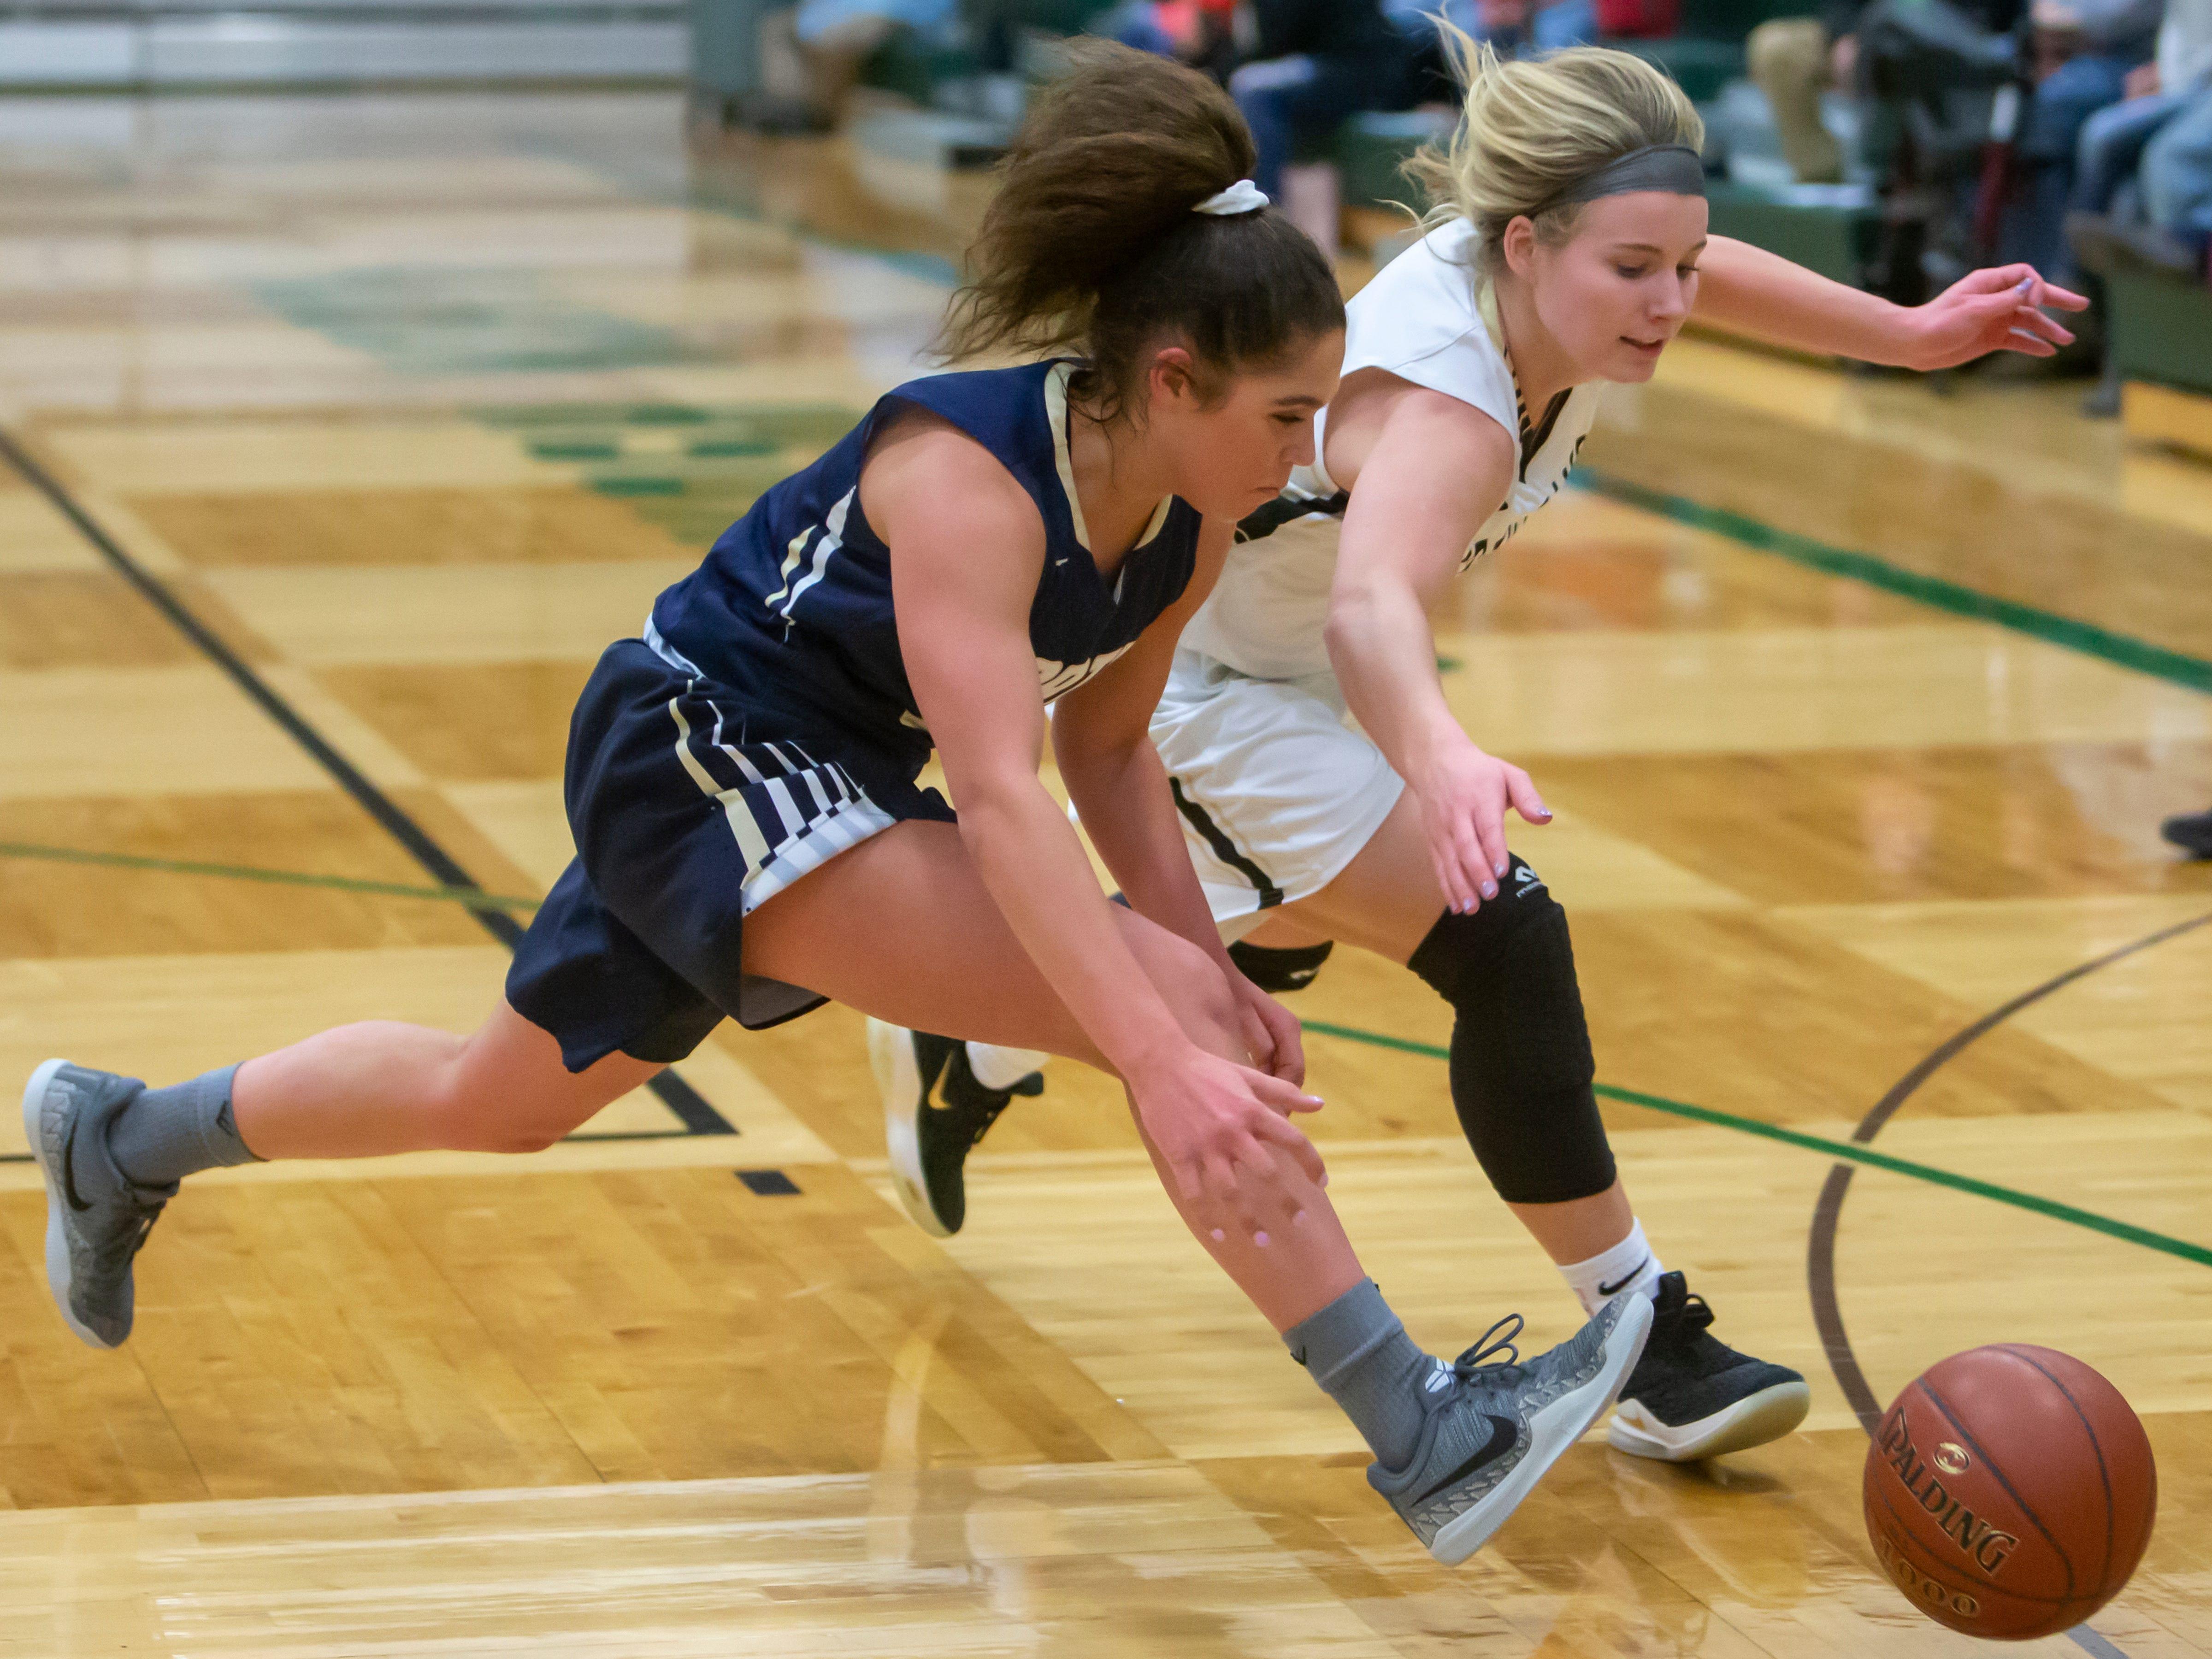 Appleton North's Niki Van Wyk and Oshkosh North's Ashley Wissink runs after the loose ball during the girls basketball game Friday, February 8, 2019, in Oshkosh, Wis., at Oshkosh North High School.